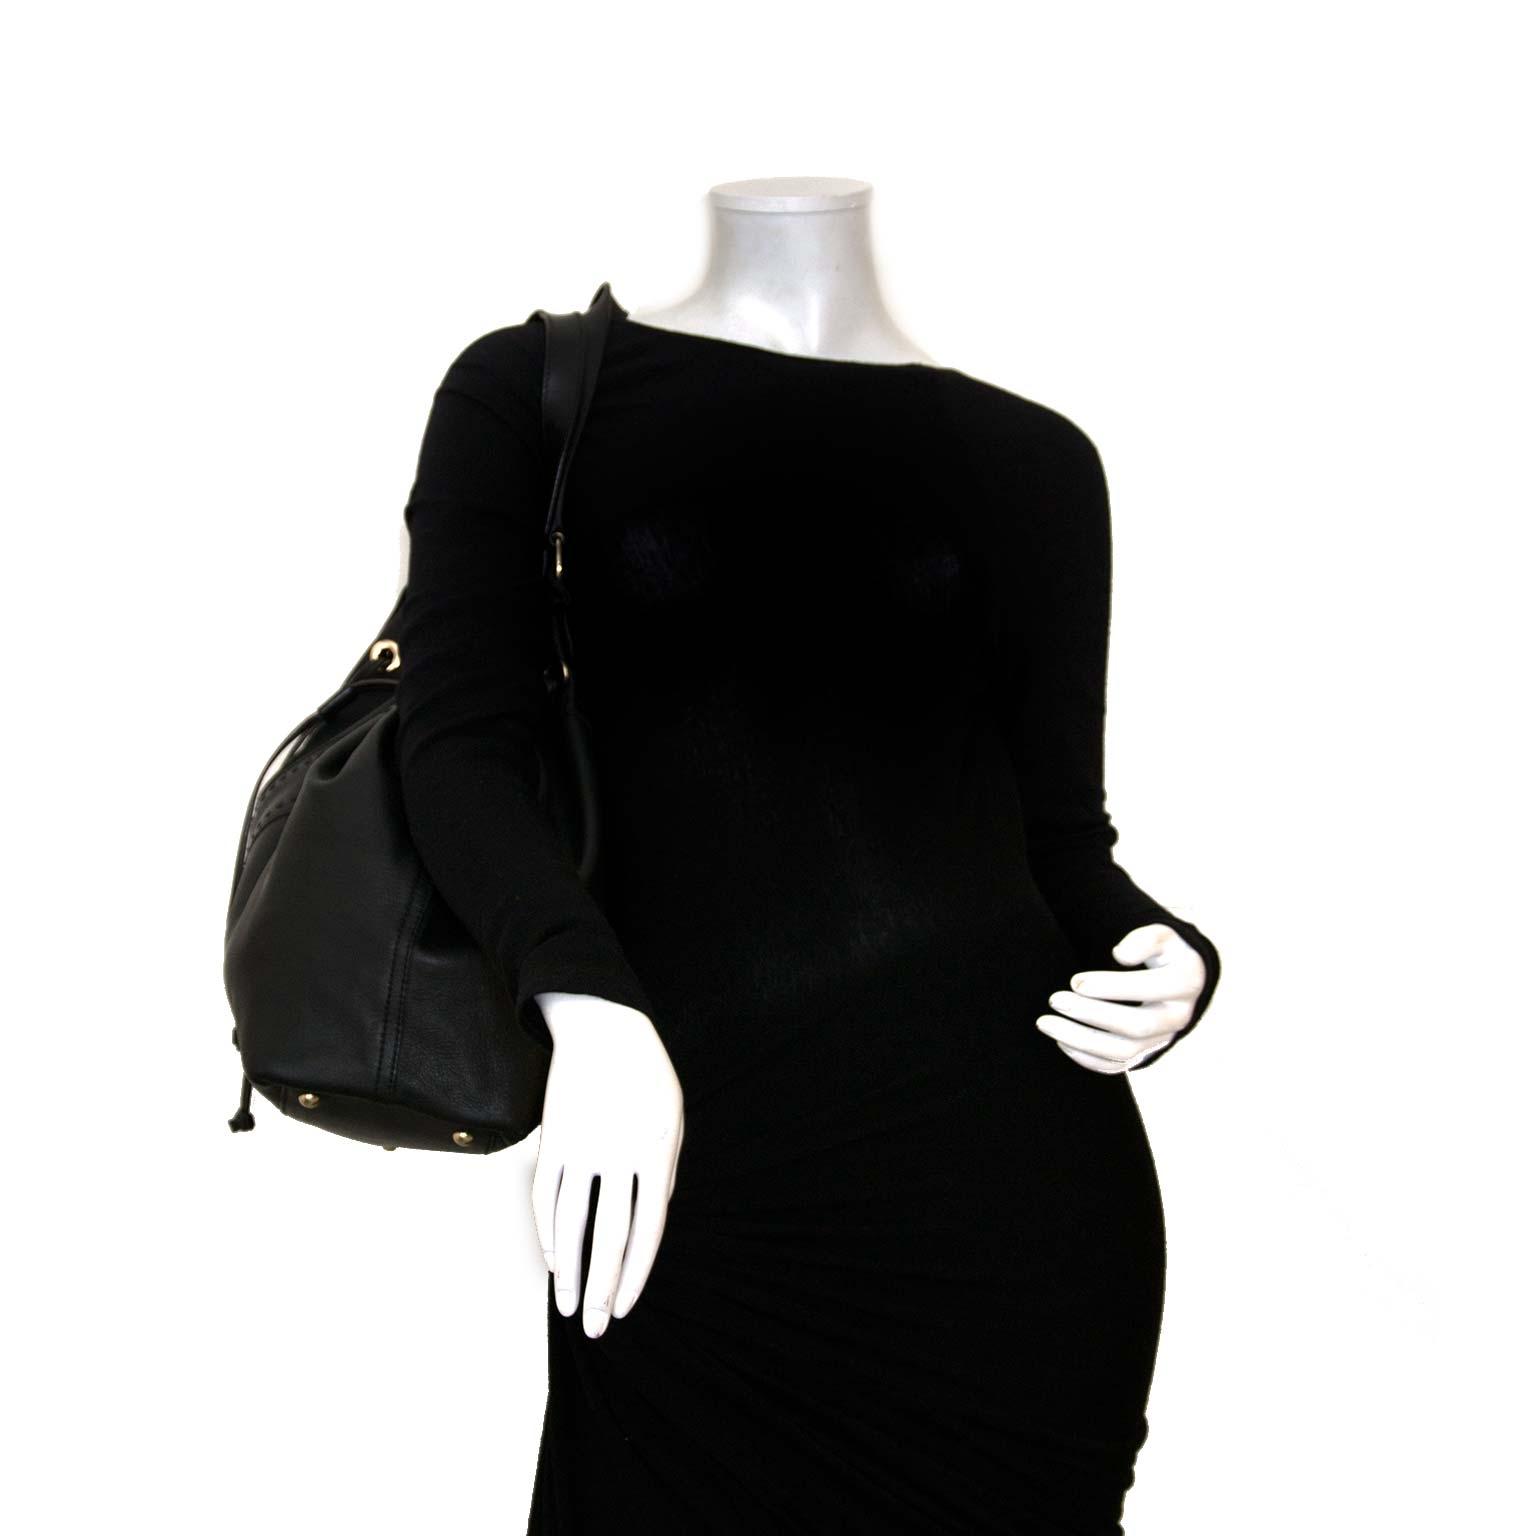 3ecbe8bf24c ... Koop authentieke Yves Saint Laurent Y tas nu online bij Labellov  vintage webshop